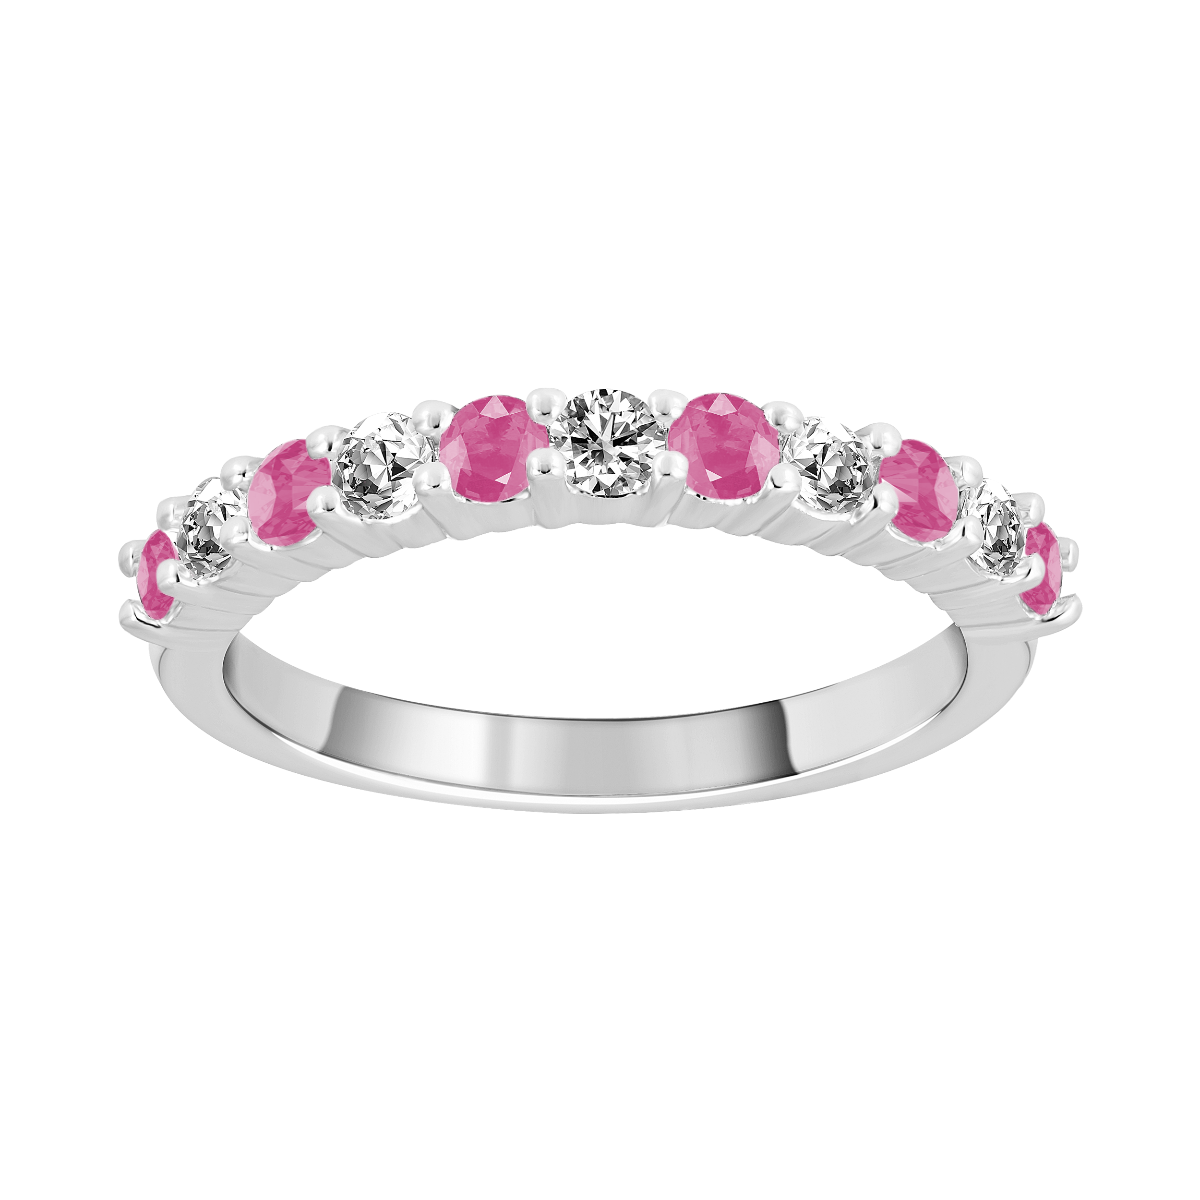 Anel de safira rosa e diamantes ouro branco